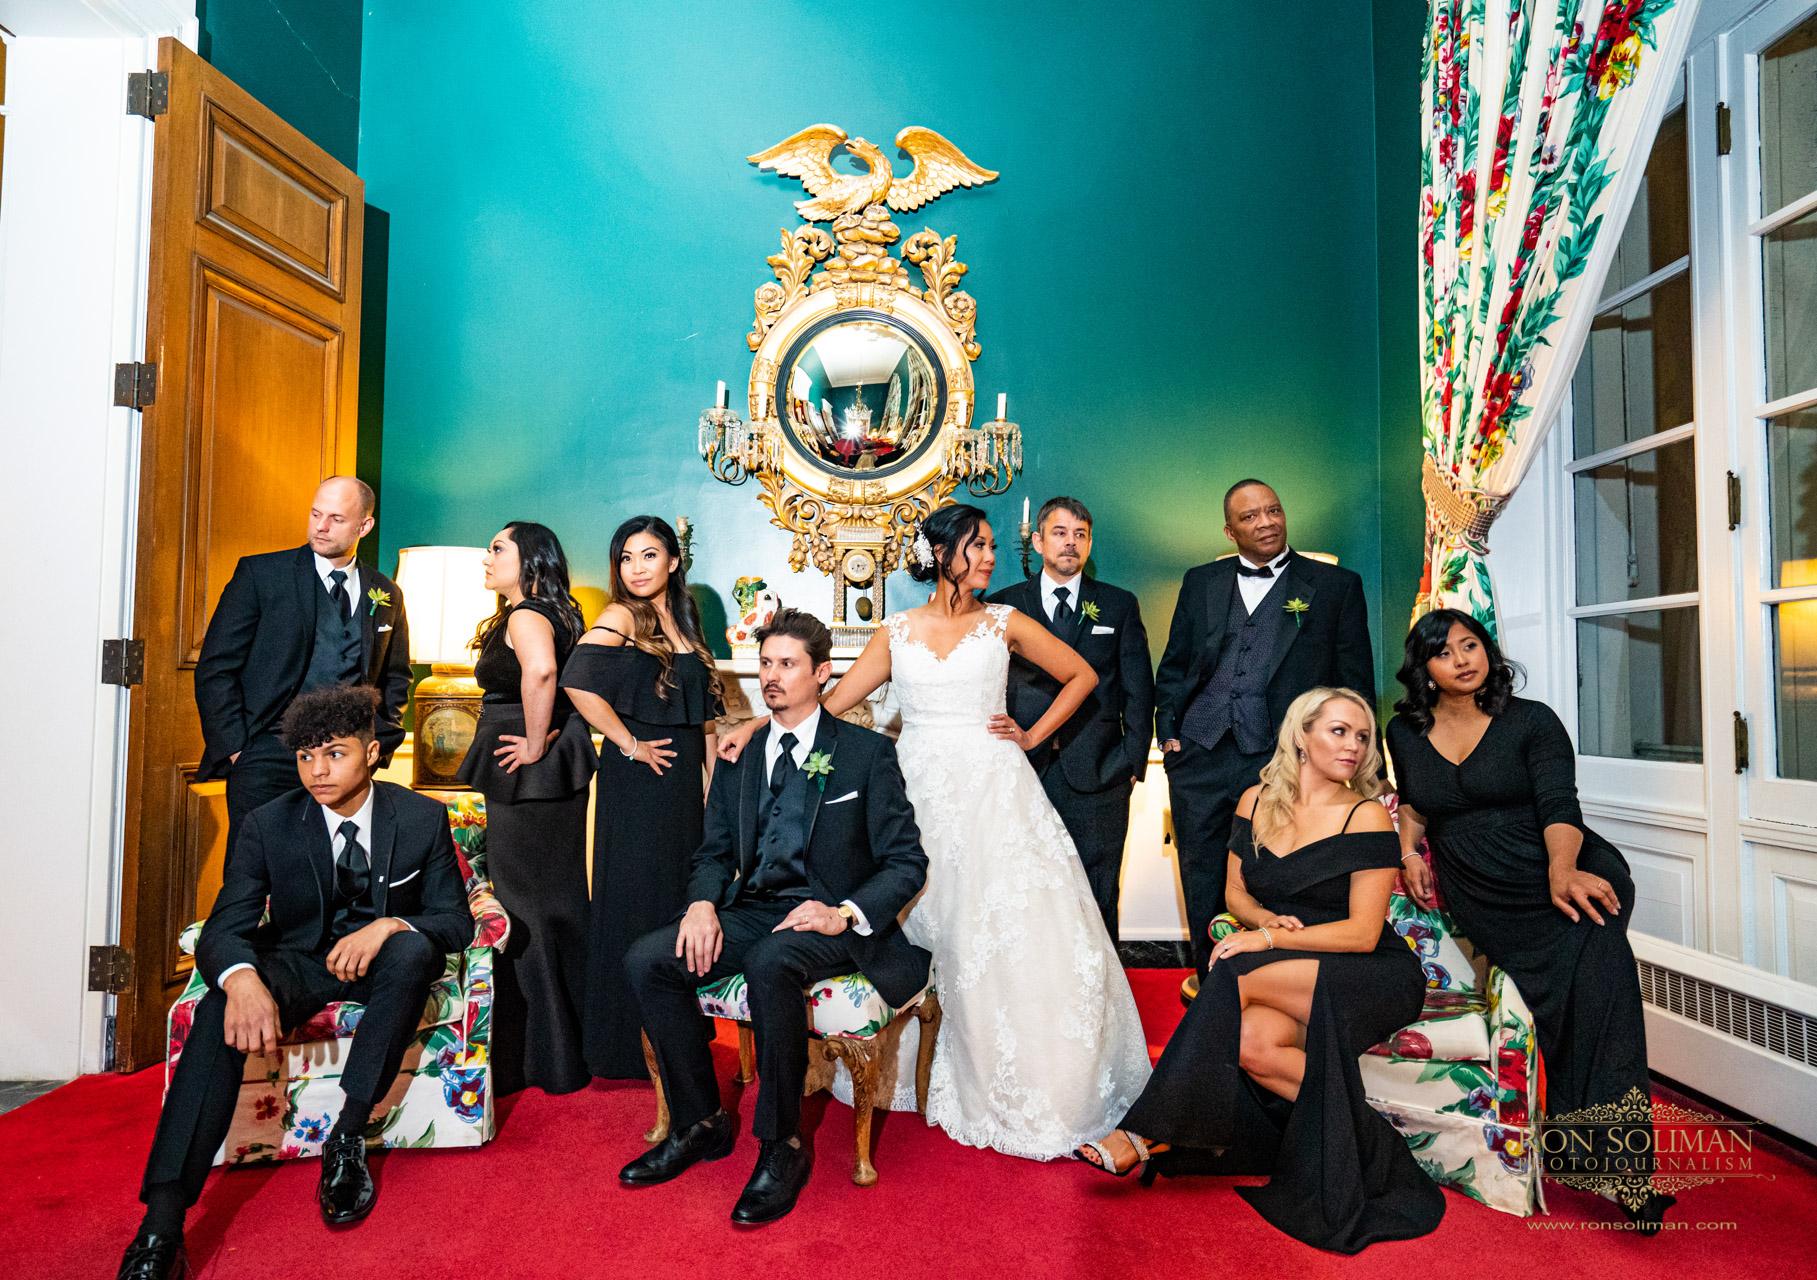 THE GREENBRIER RESORT WEDDING 38